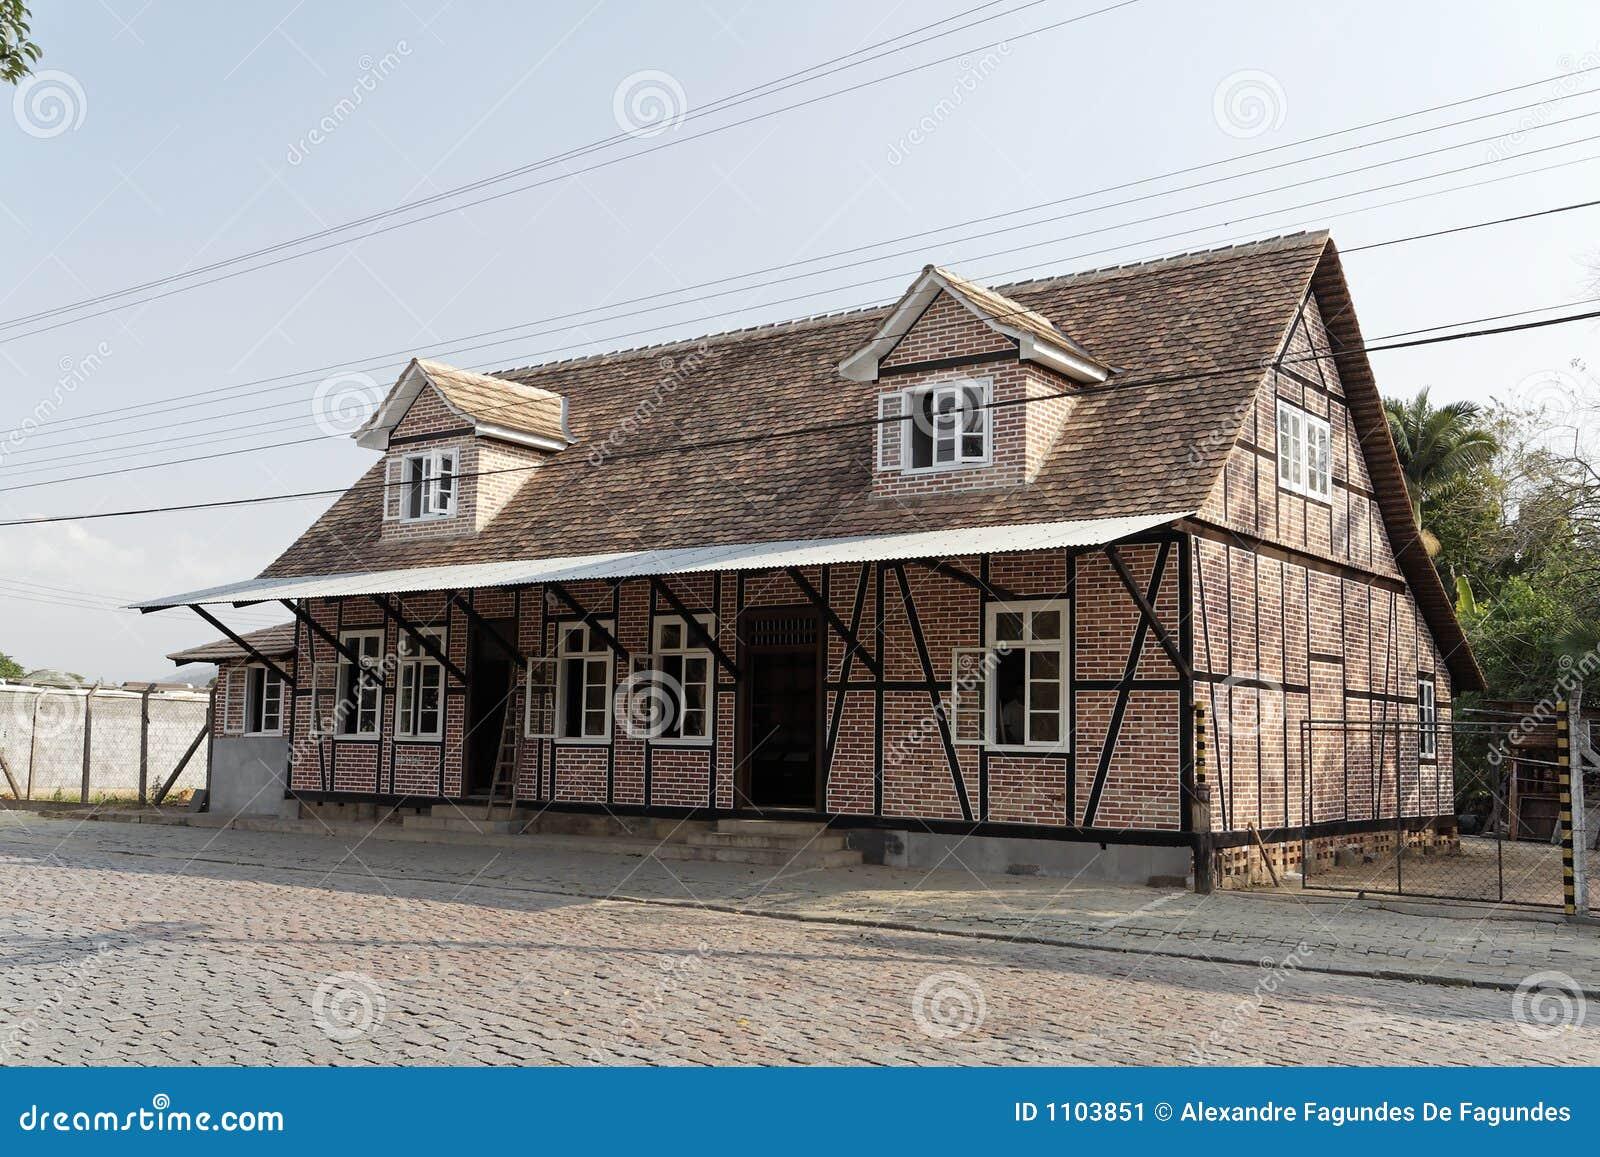 typical german half timbered historical house stock image image 1103851. Black Bedroom Furniture Sets. Home Design Ideas